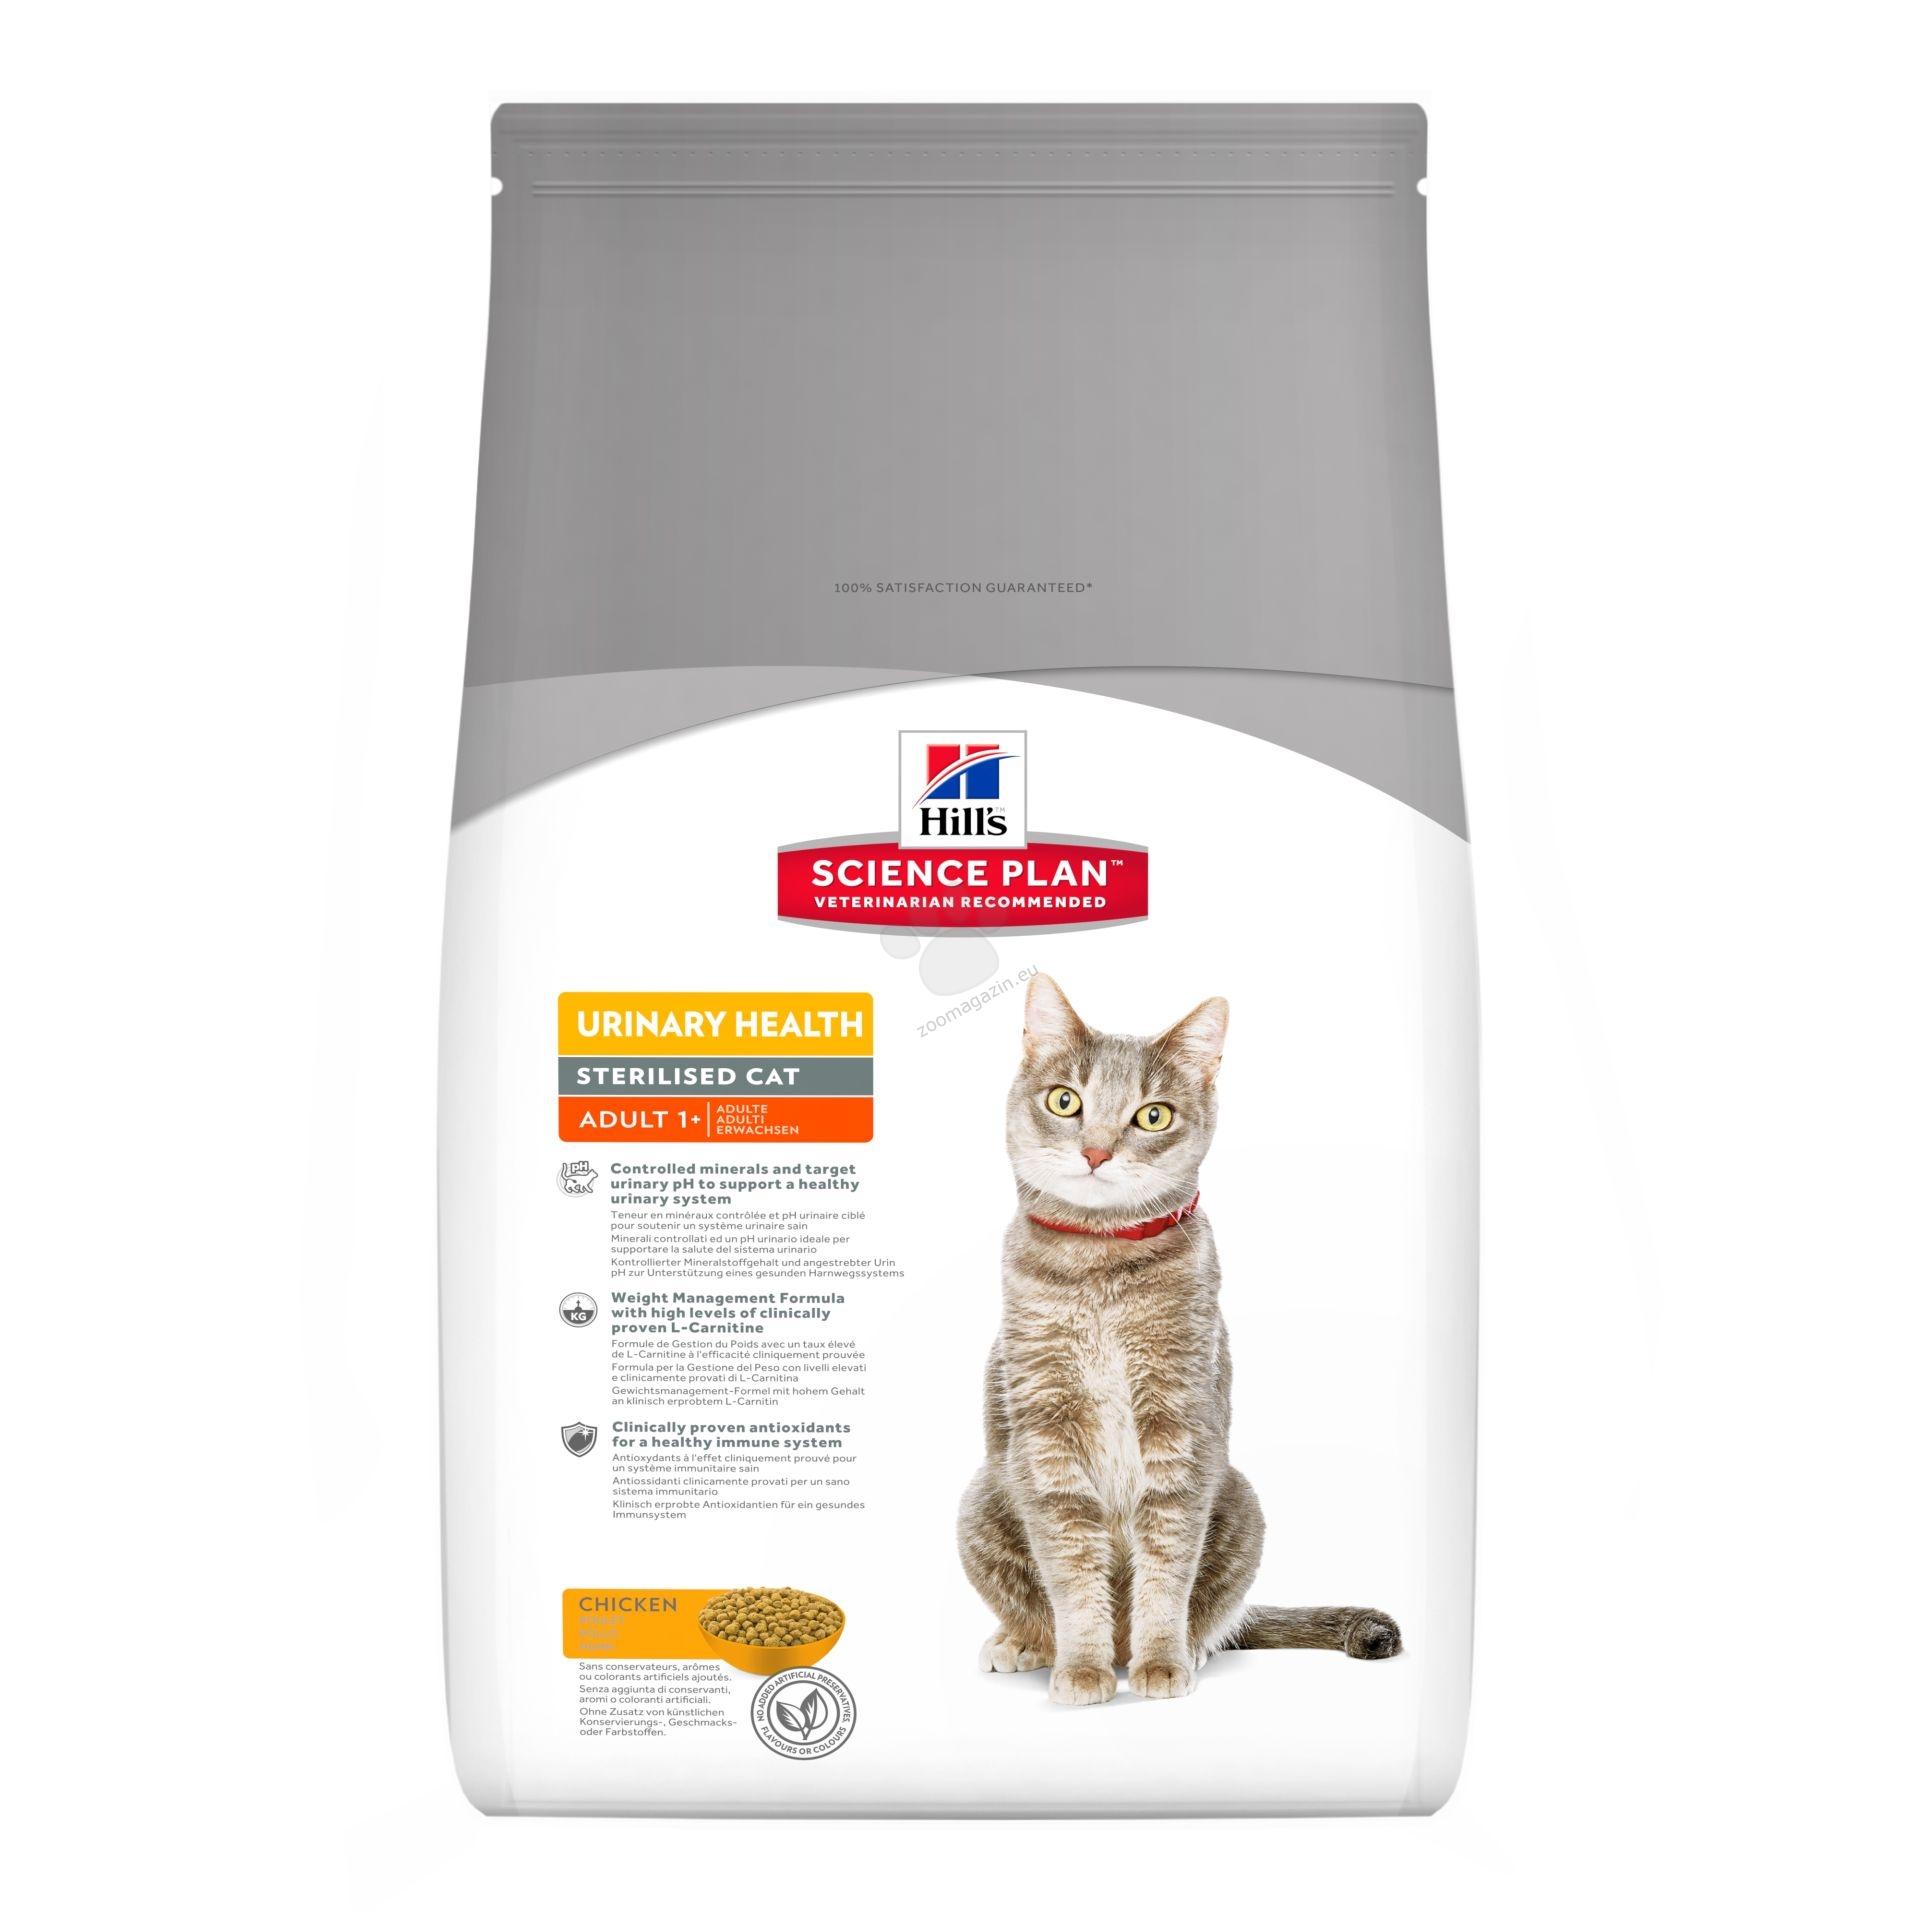 Science Plan Feline Adult Urinary&Sterilized Cat Chicken - с пилешко - за кастрирани котки и профилактика на уринарния тракт 8 кг. + ПОДАРЪК: 2 кутии x 12 пауча Sterilised FAVOURITE SELECTION